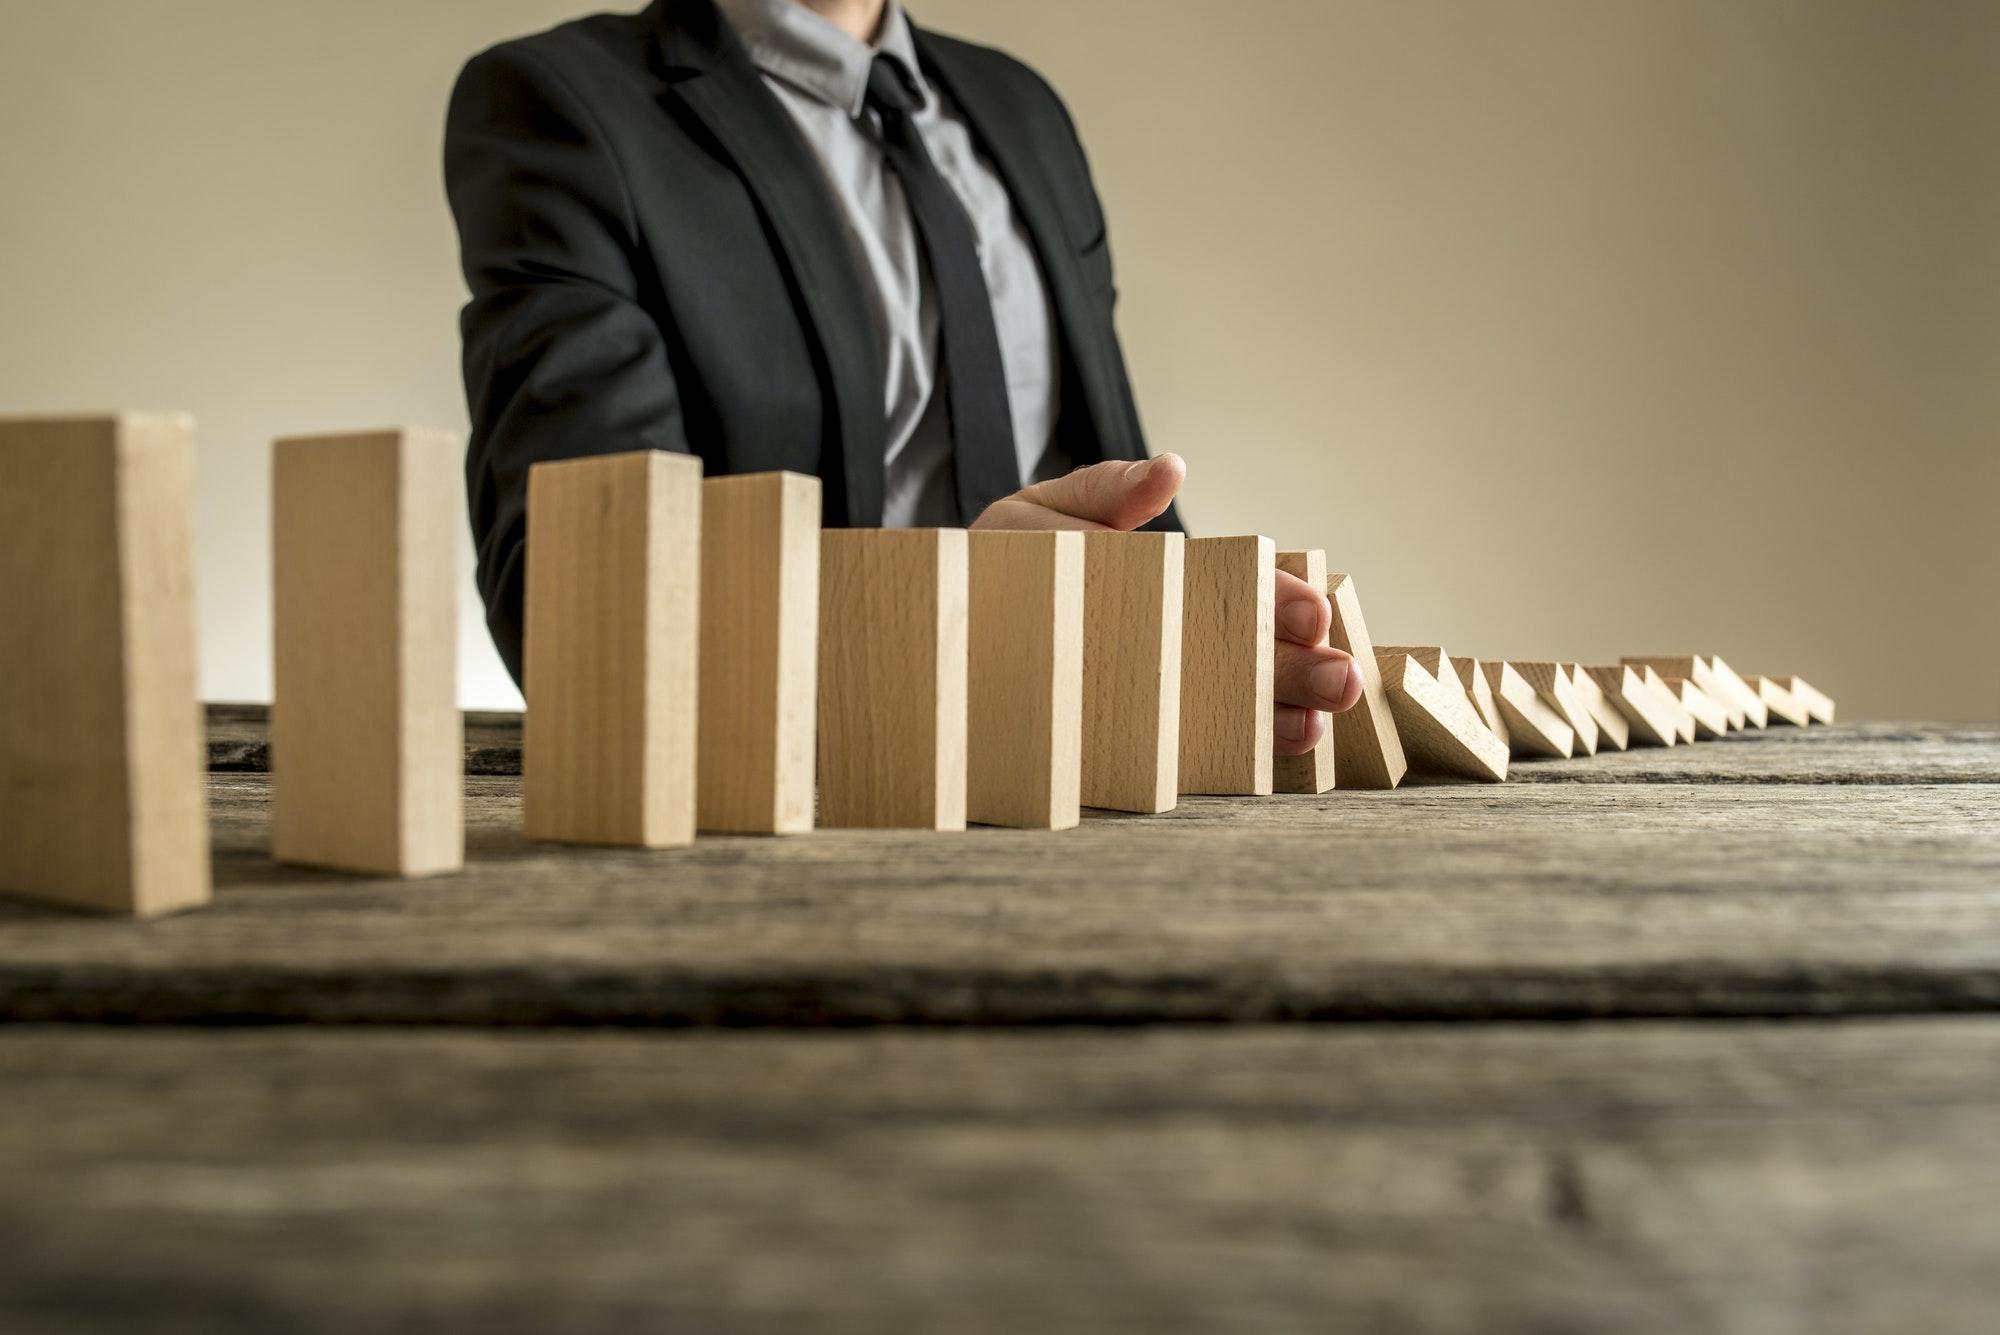 entreprises-avocat-creation-entreprise-vente-donation-liquidation-agn-avocats.jpg